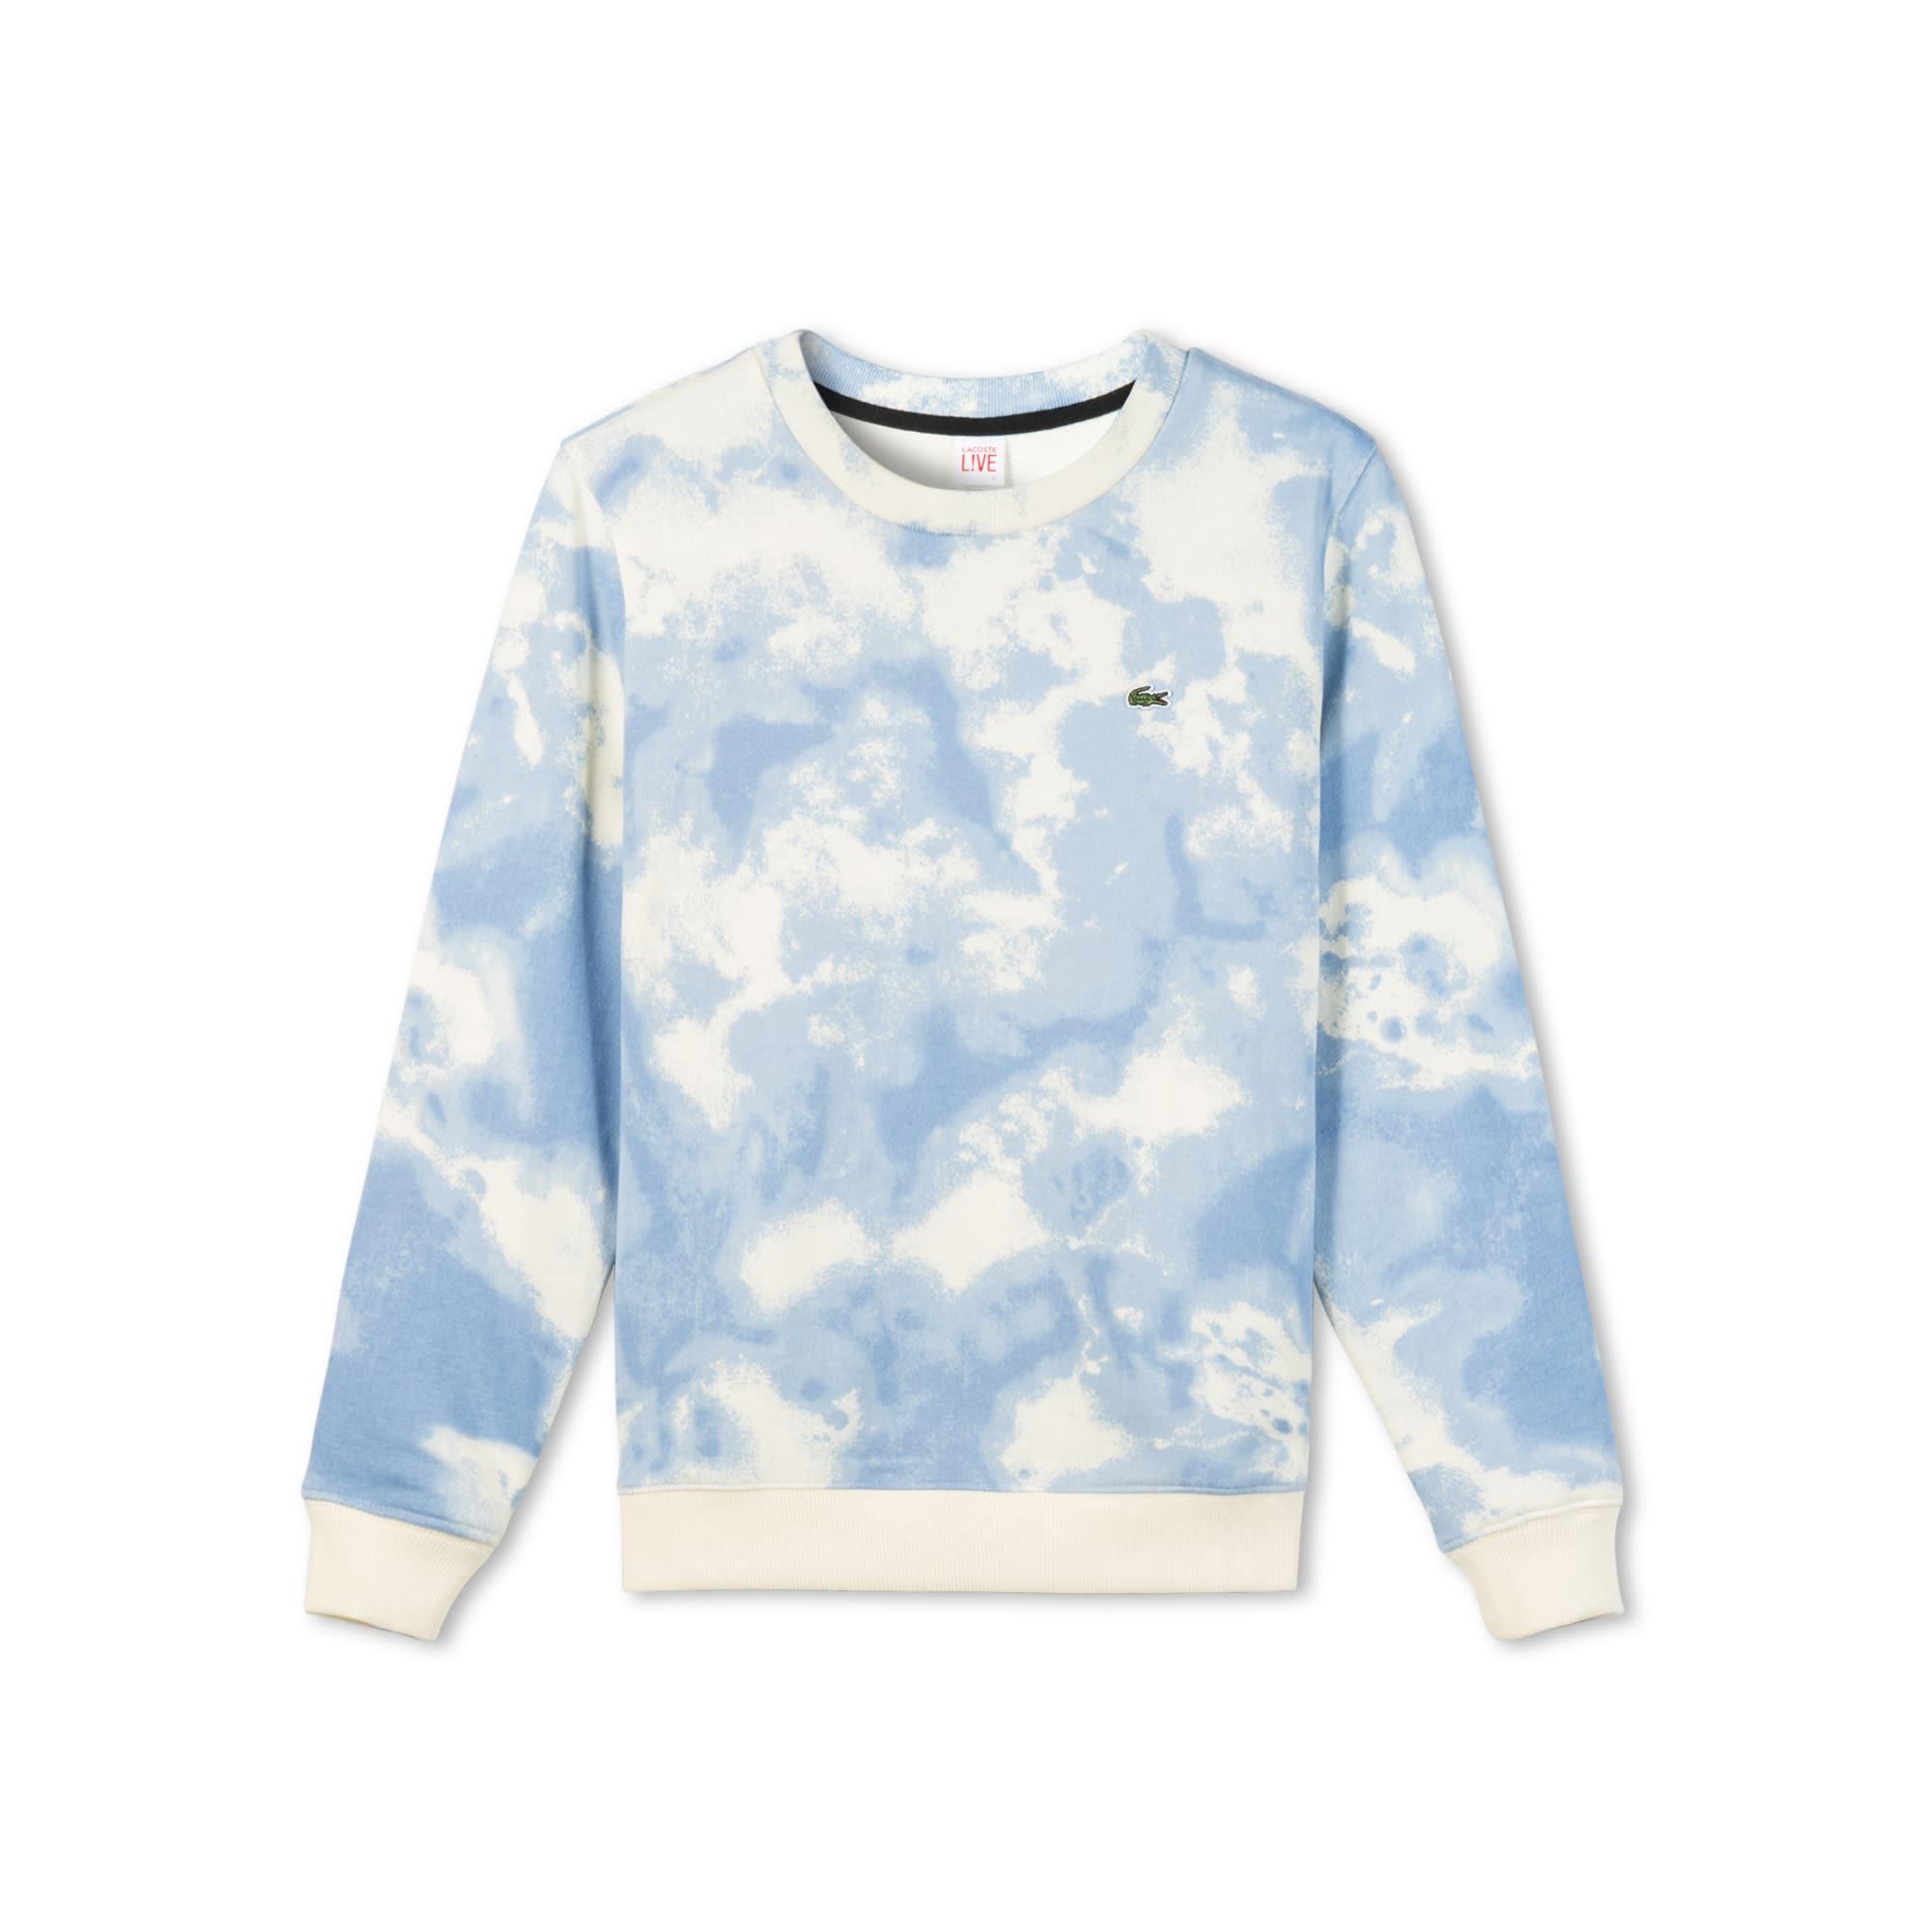 Lacoste LIVE系列女士圆领云朵印花拉绒运动衫